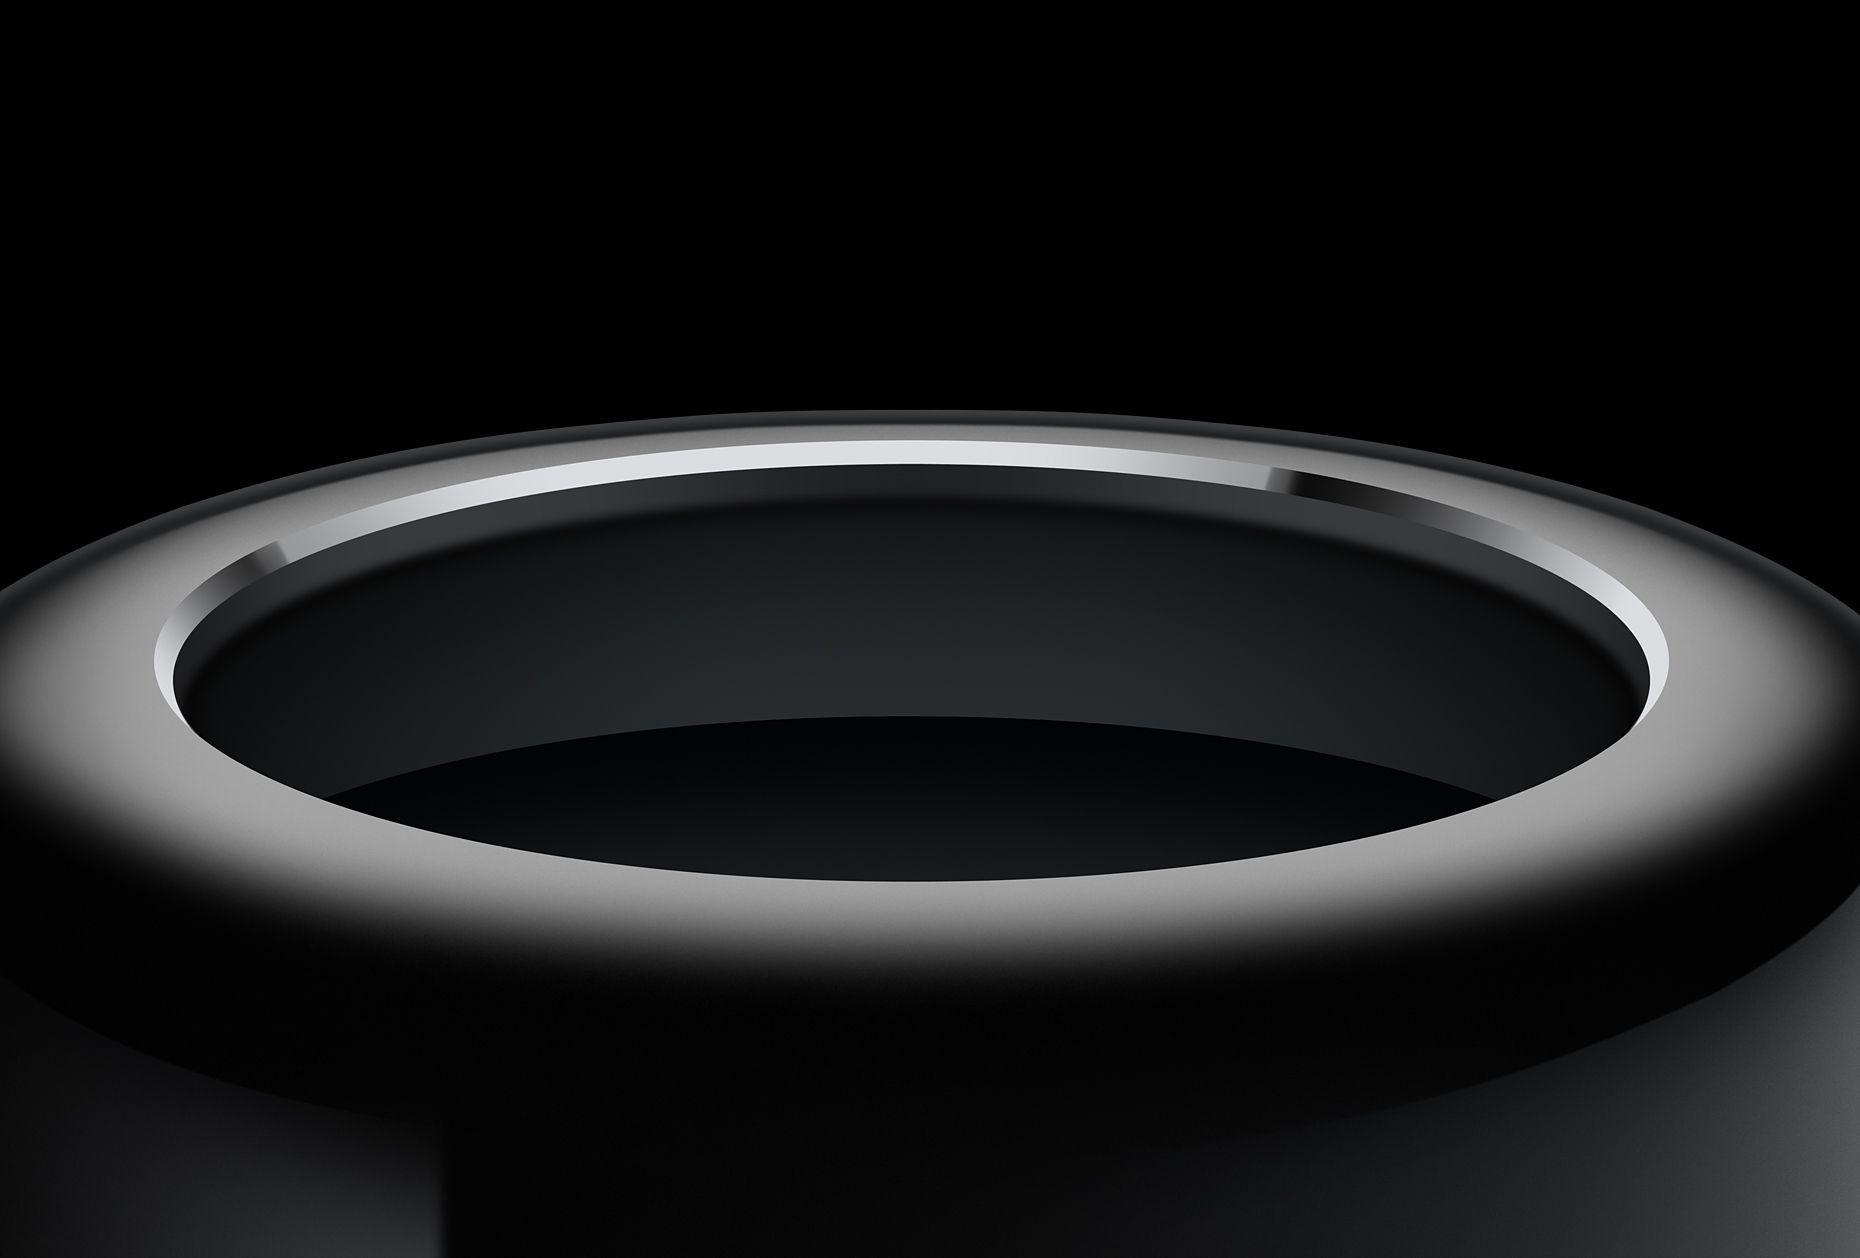 Apple оновила Mac Pro вперше за 4 роки